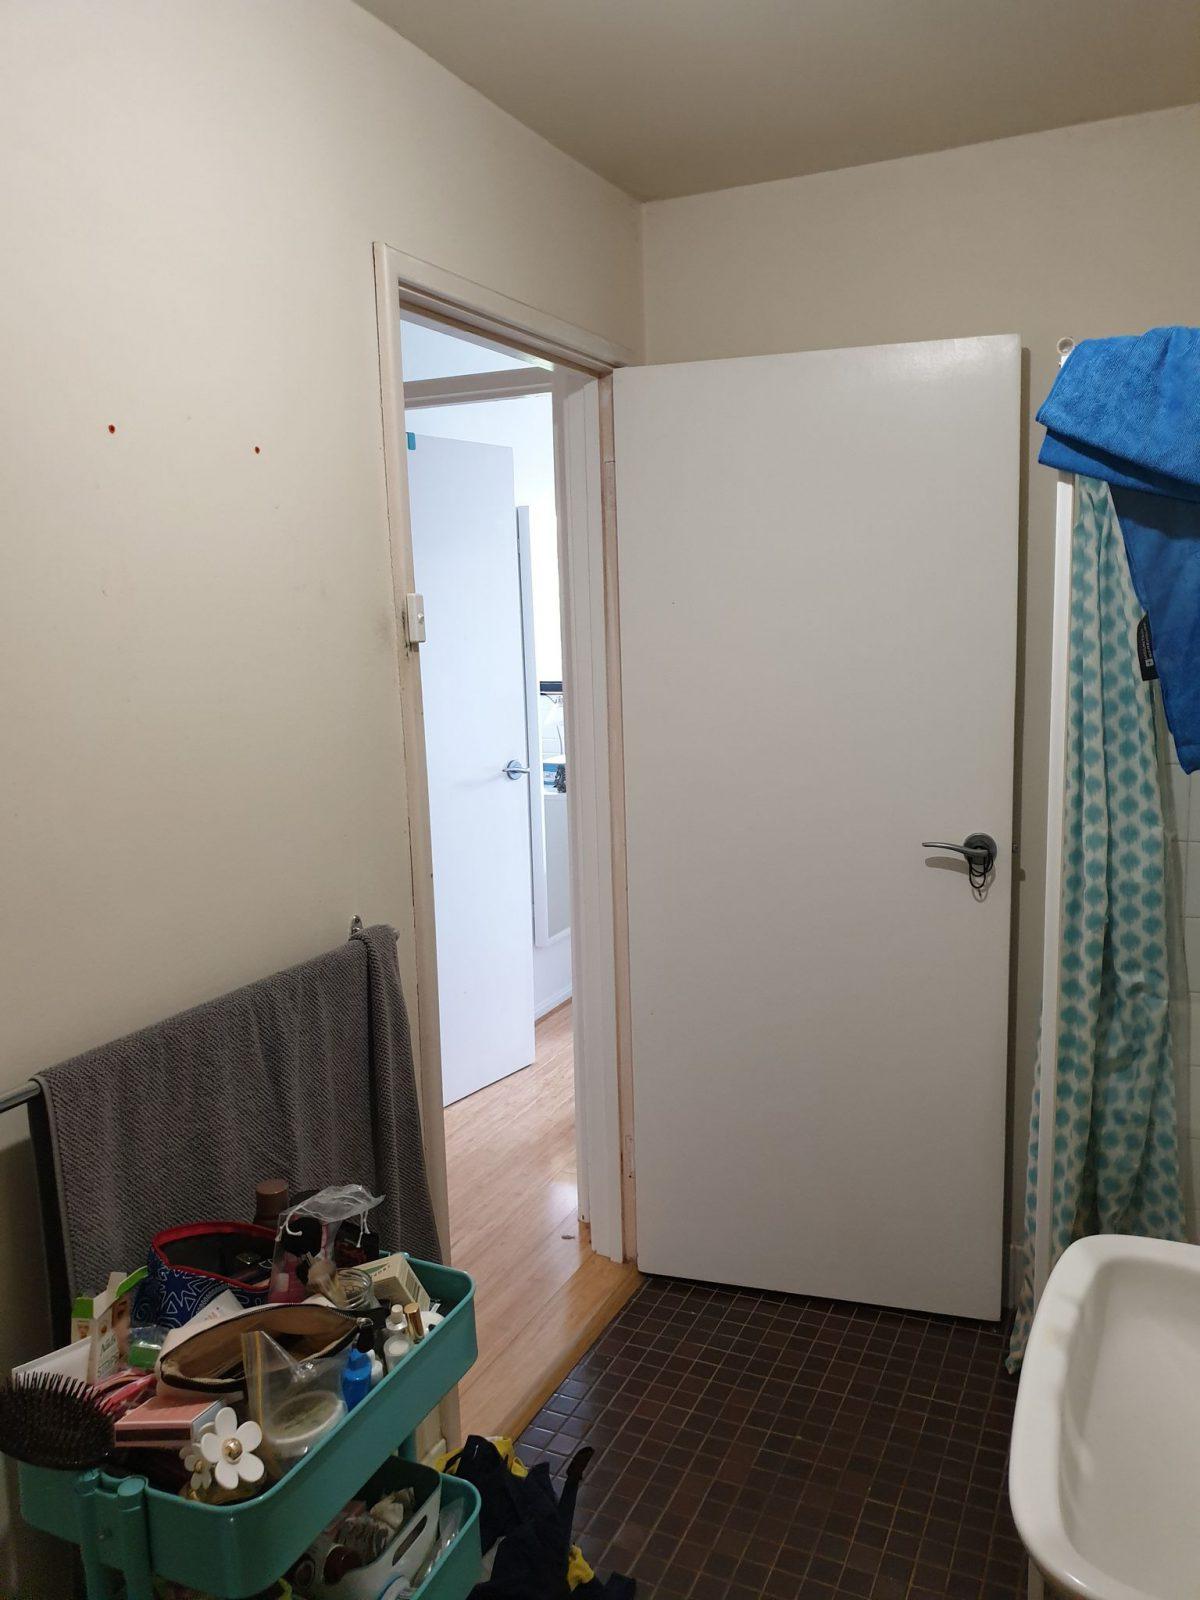 Mosman Park Bathroom Renovation - AAS